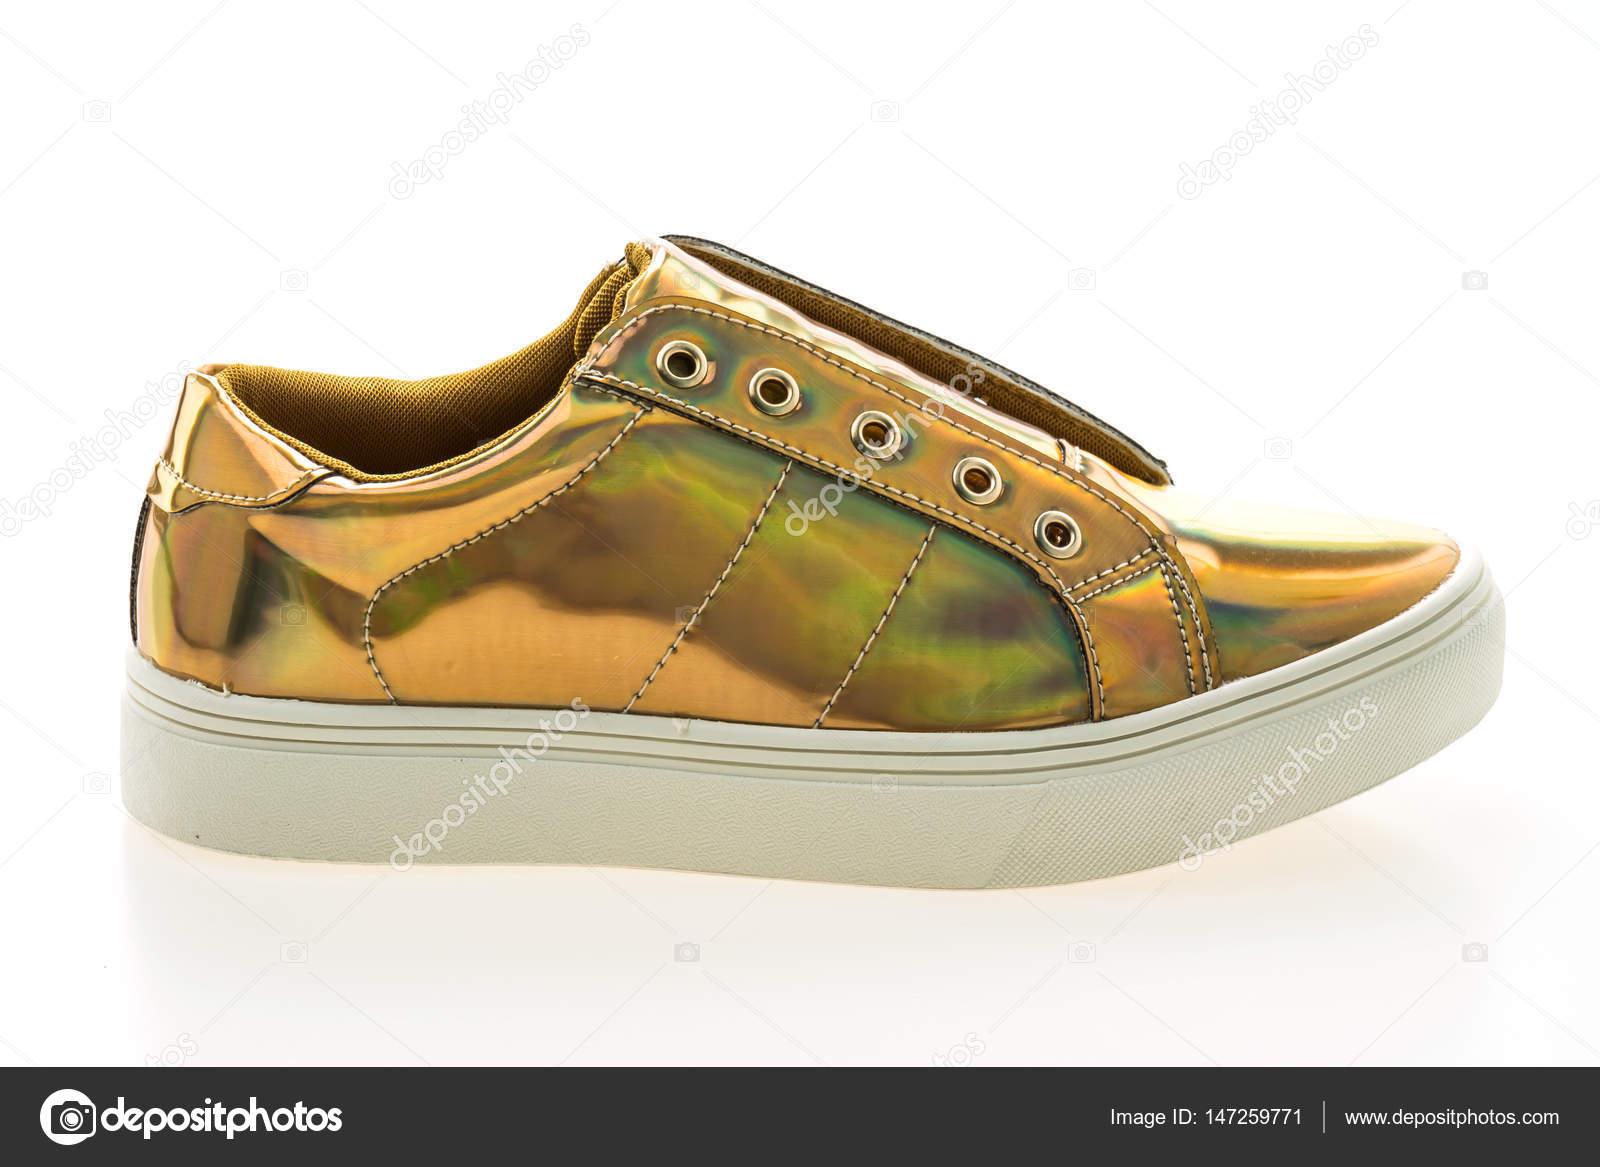 58bf9020092 Παπούτσια μόδας και ύπουλος — Φωτογραφία Αρχείου © mrsiraphol #147259771